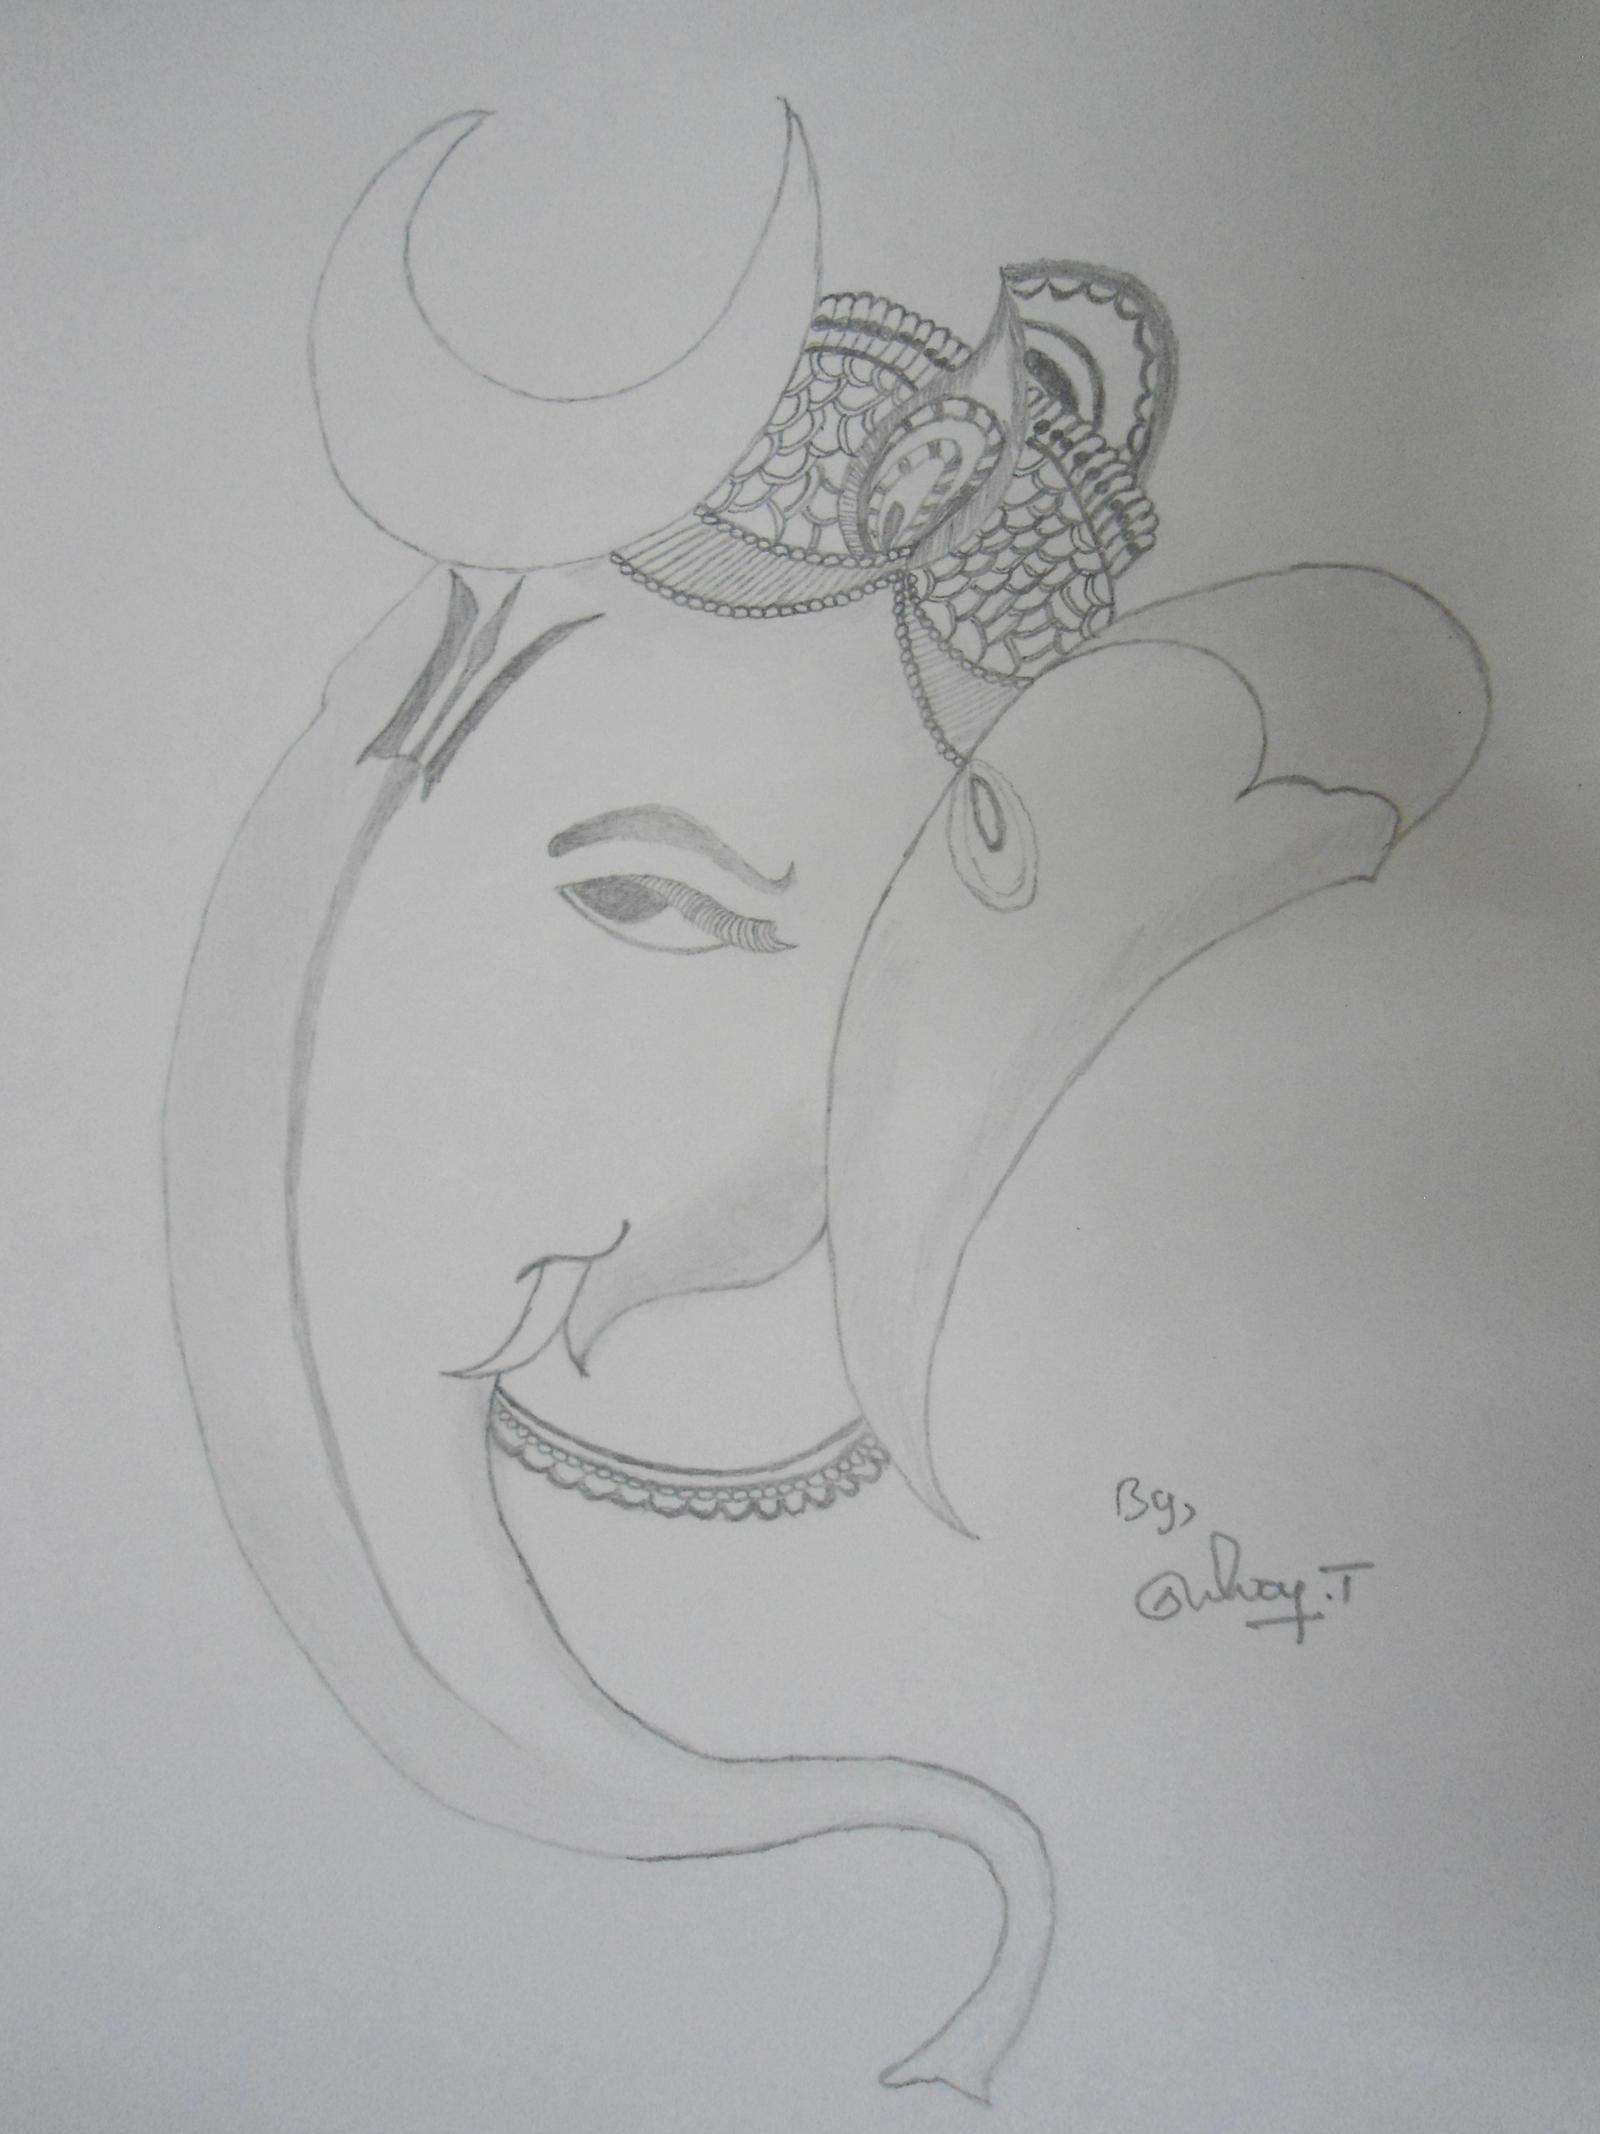 Lord Ganesha Sketch Ganapathi Pencil Drawings By Selvantamilmani On Deviantart